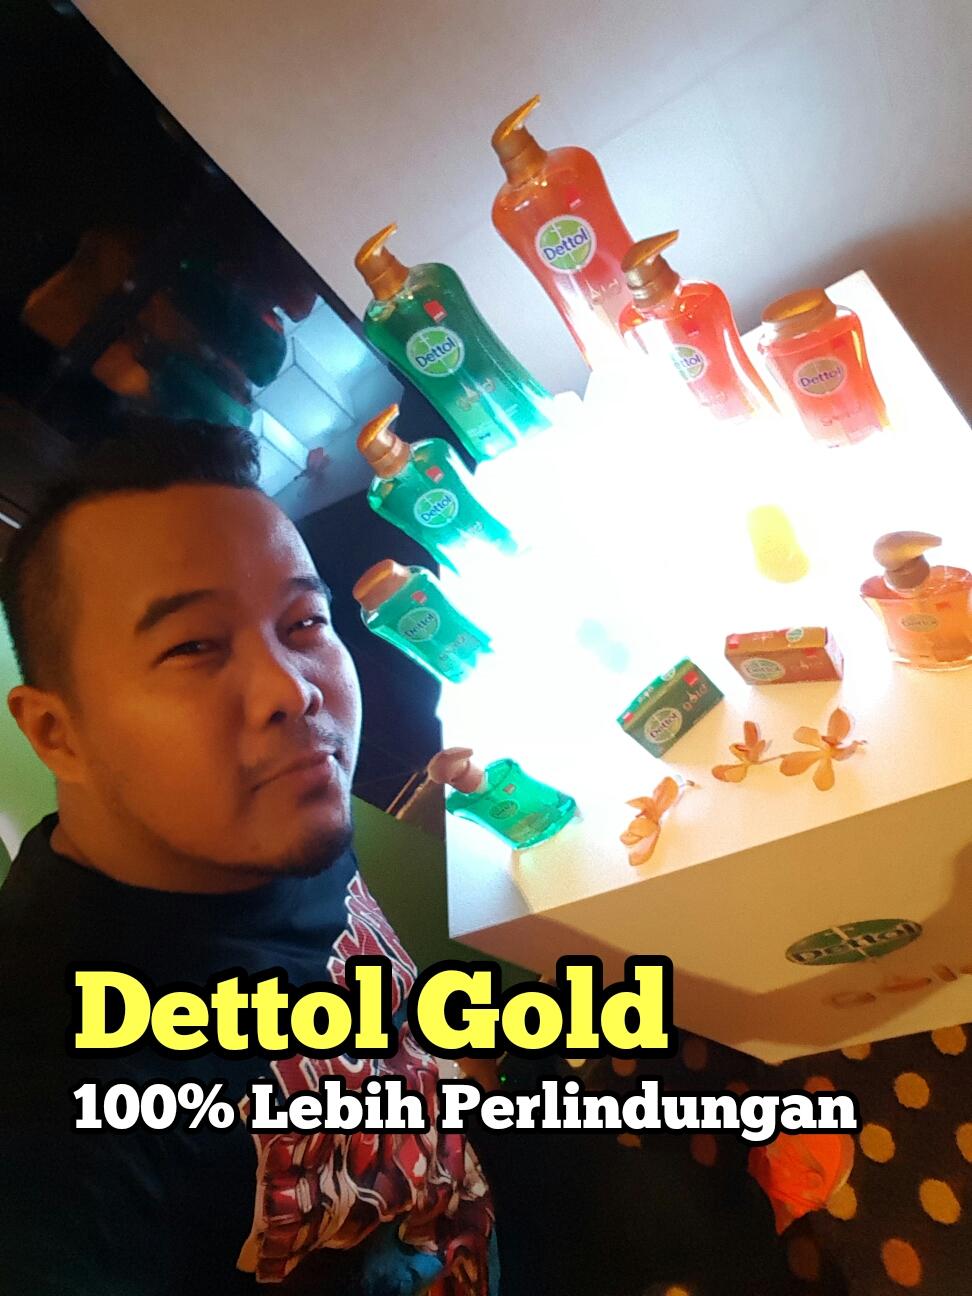 Sabun Dettol Gold 100% Lebih Perlindungan Untuk Keluarga